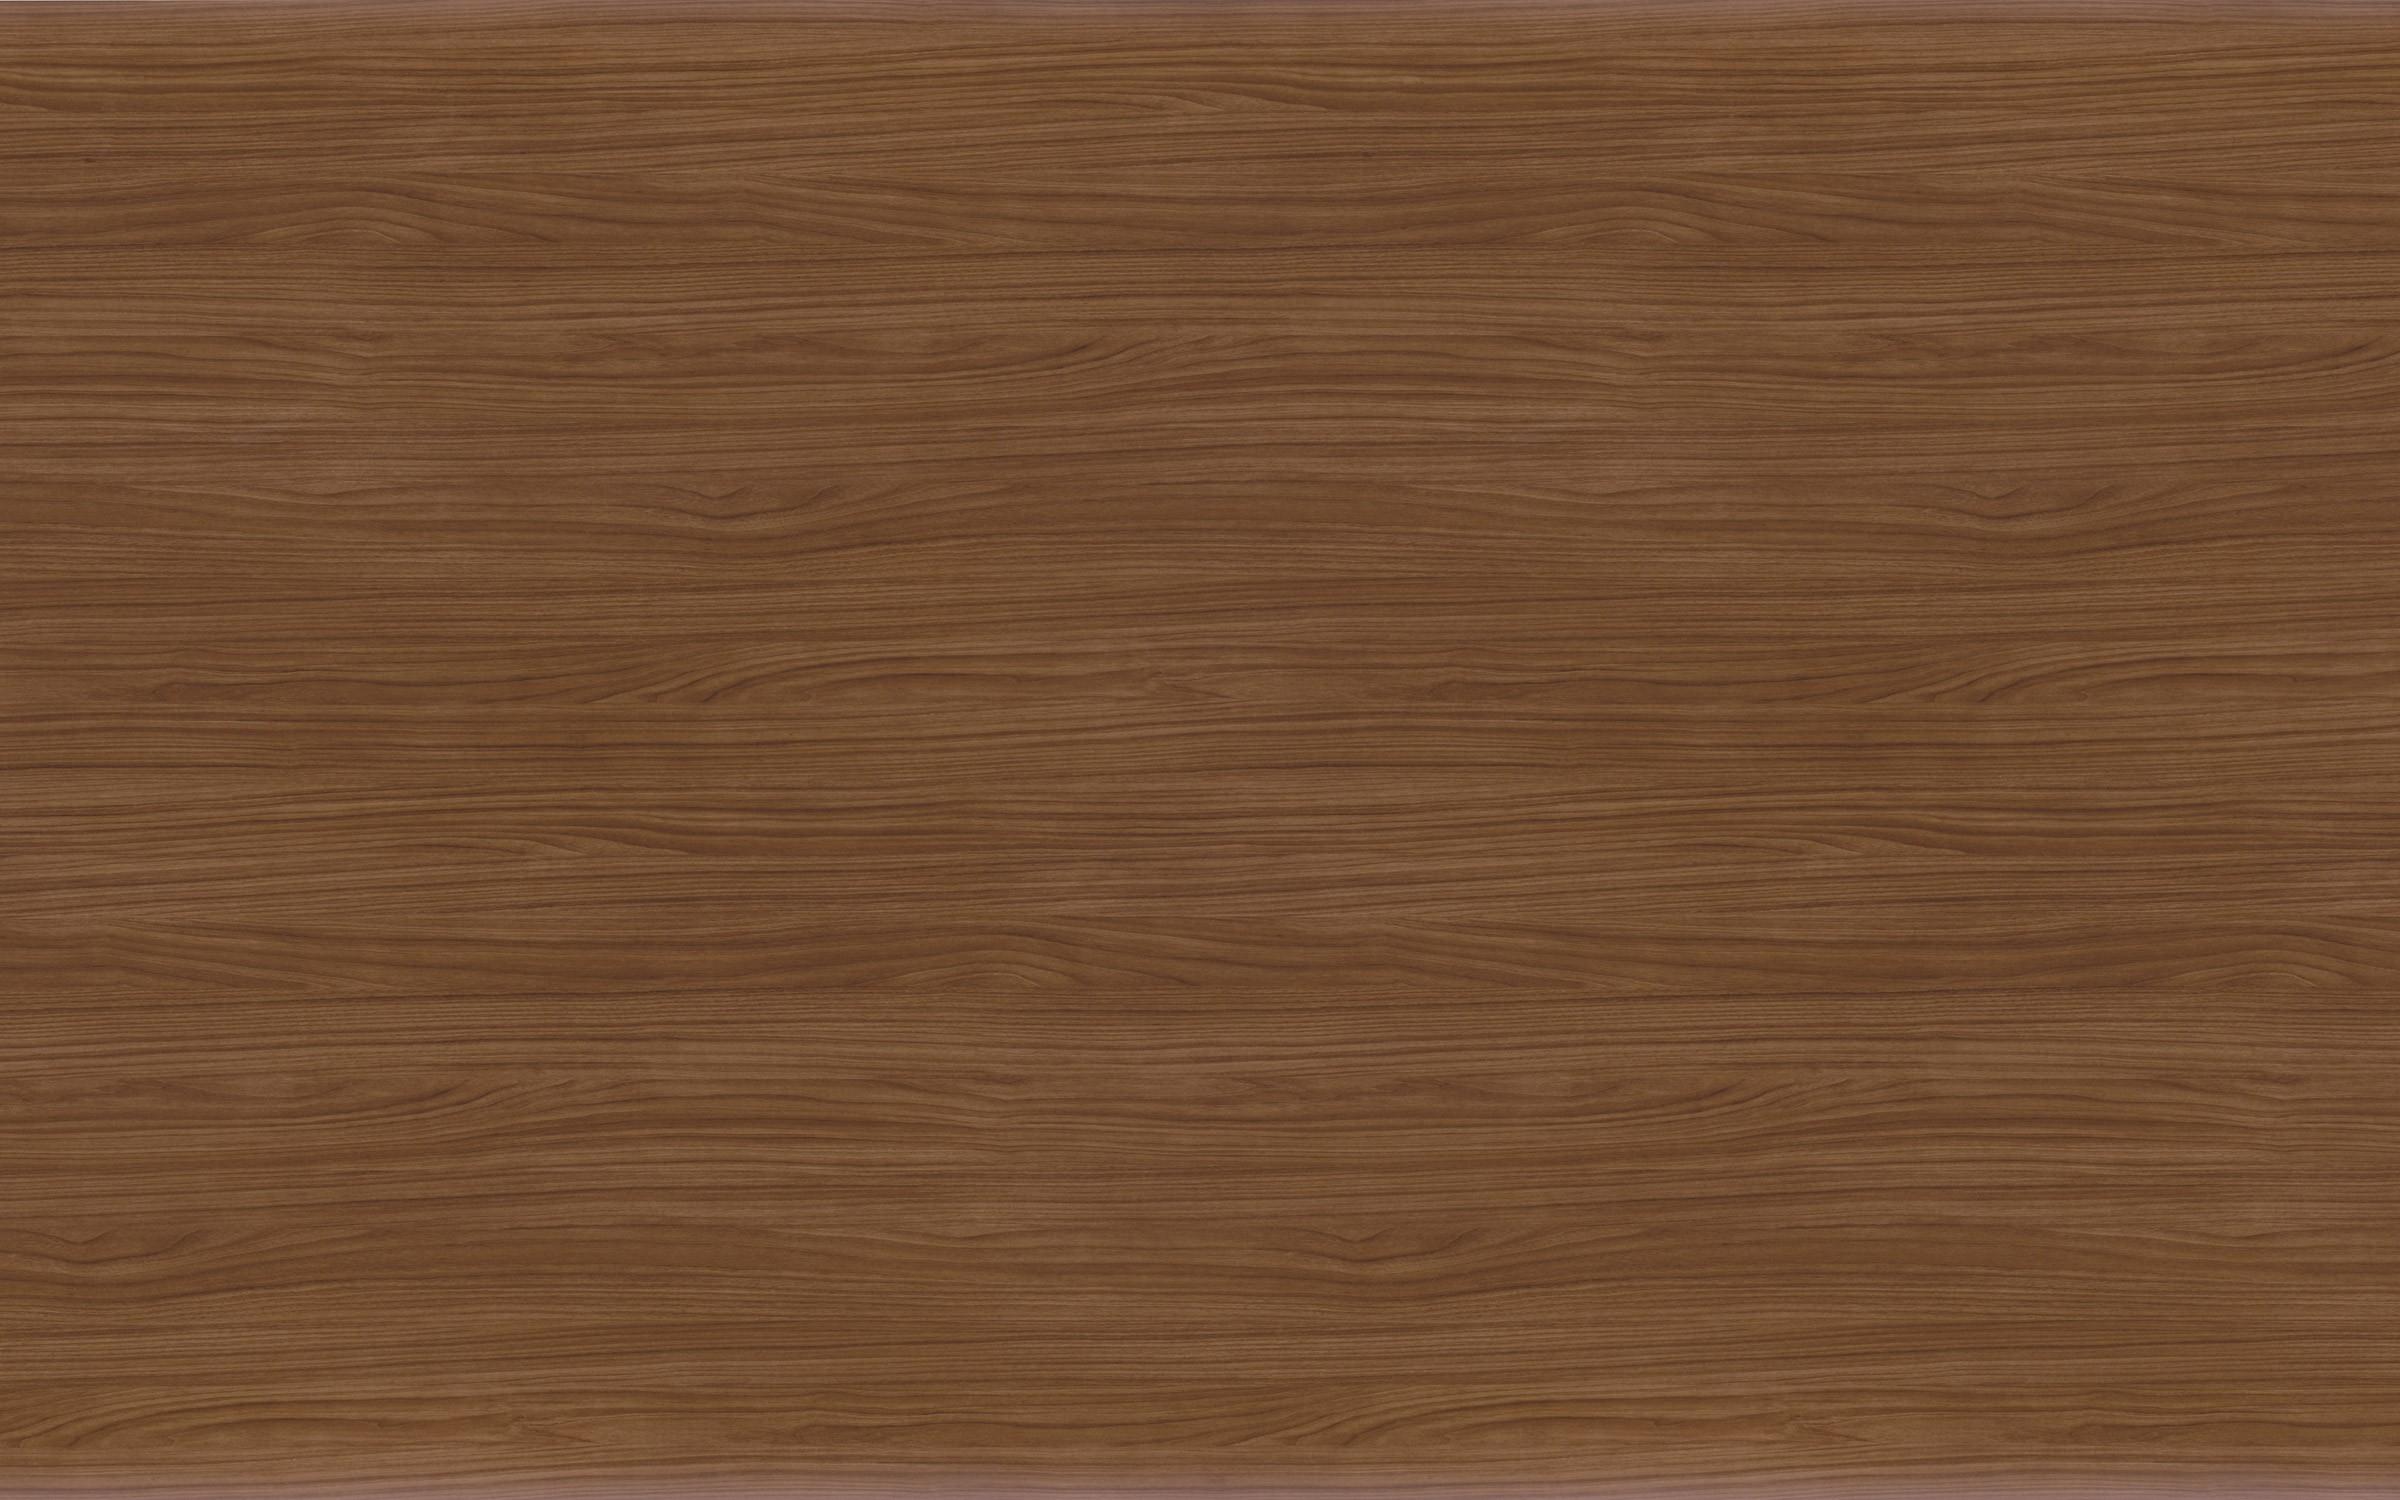 Wood Website Design